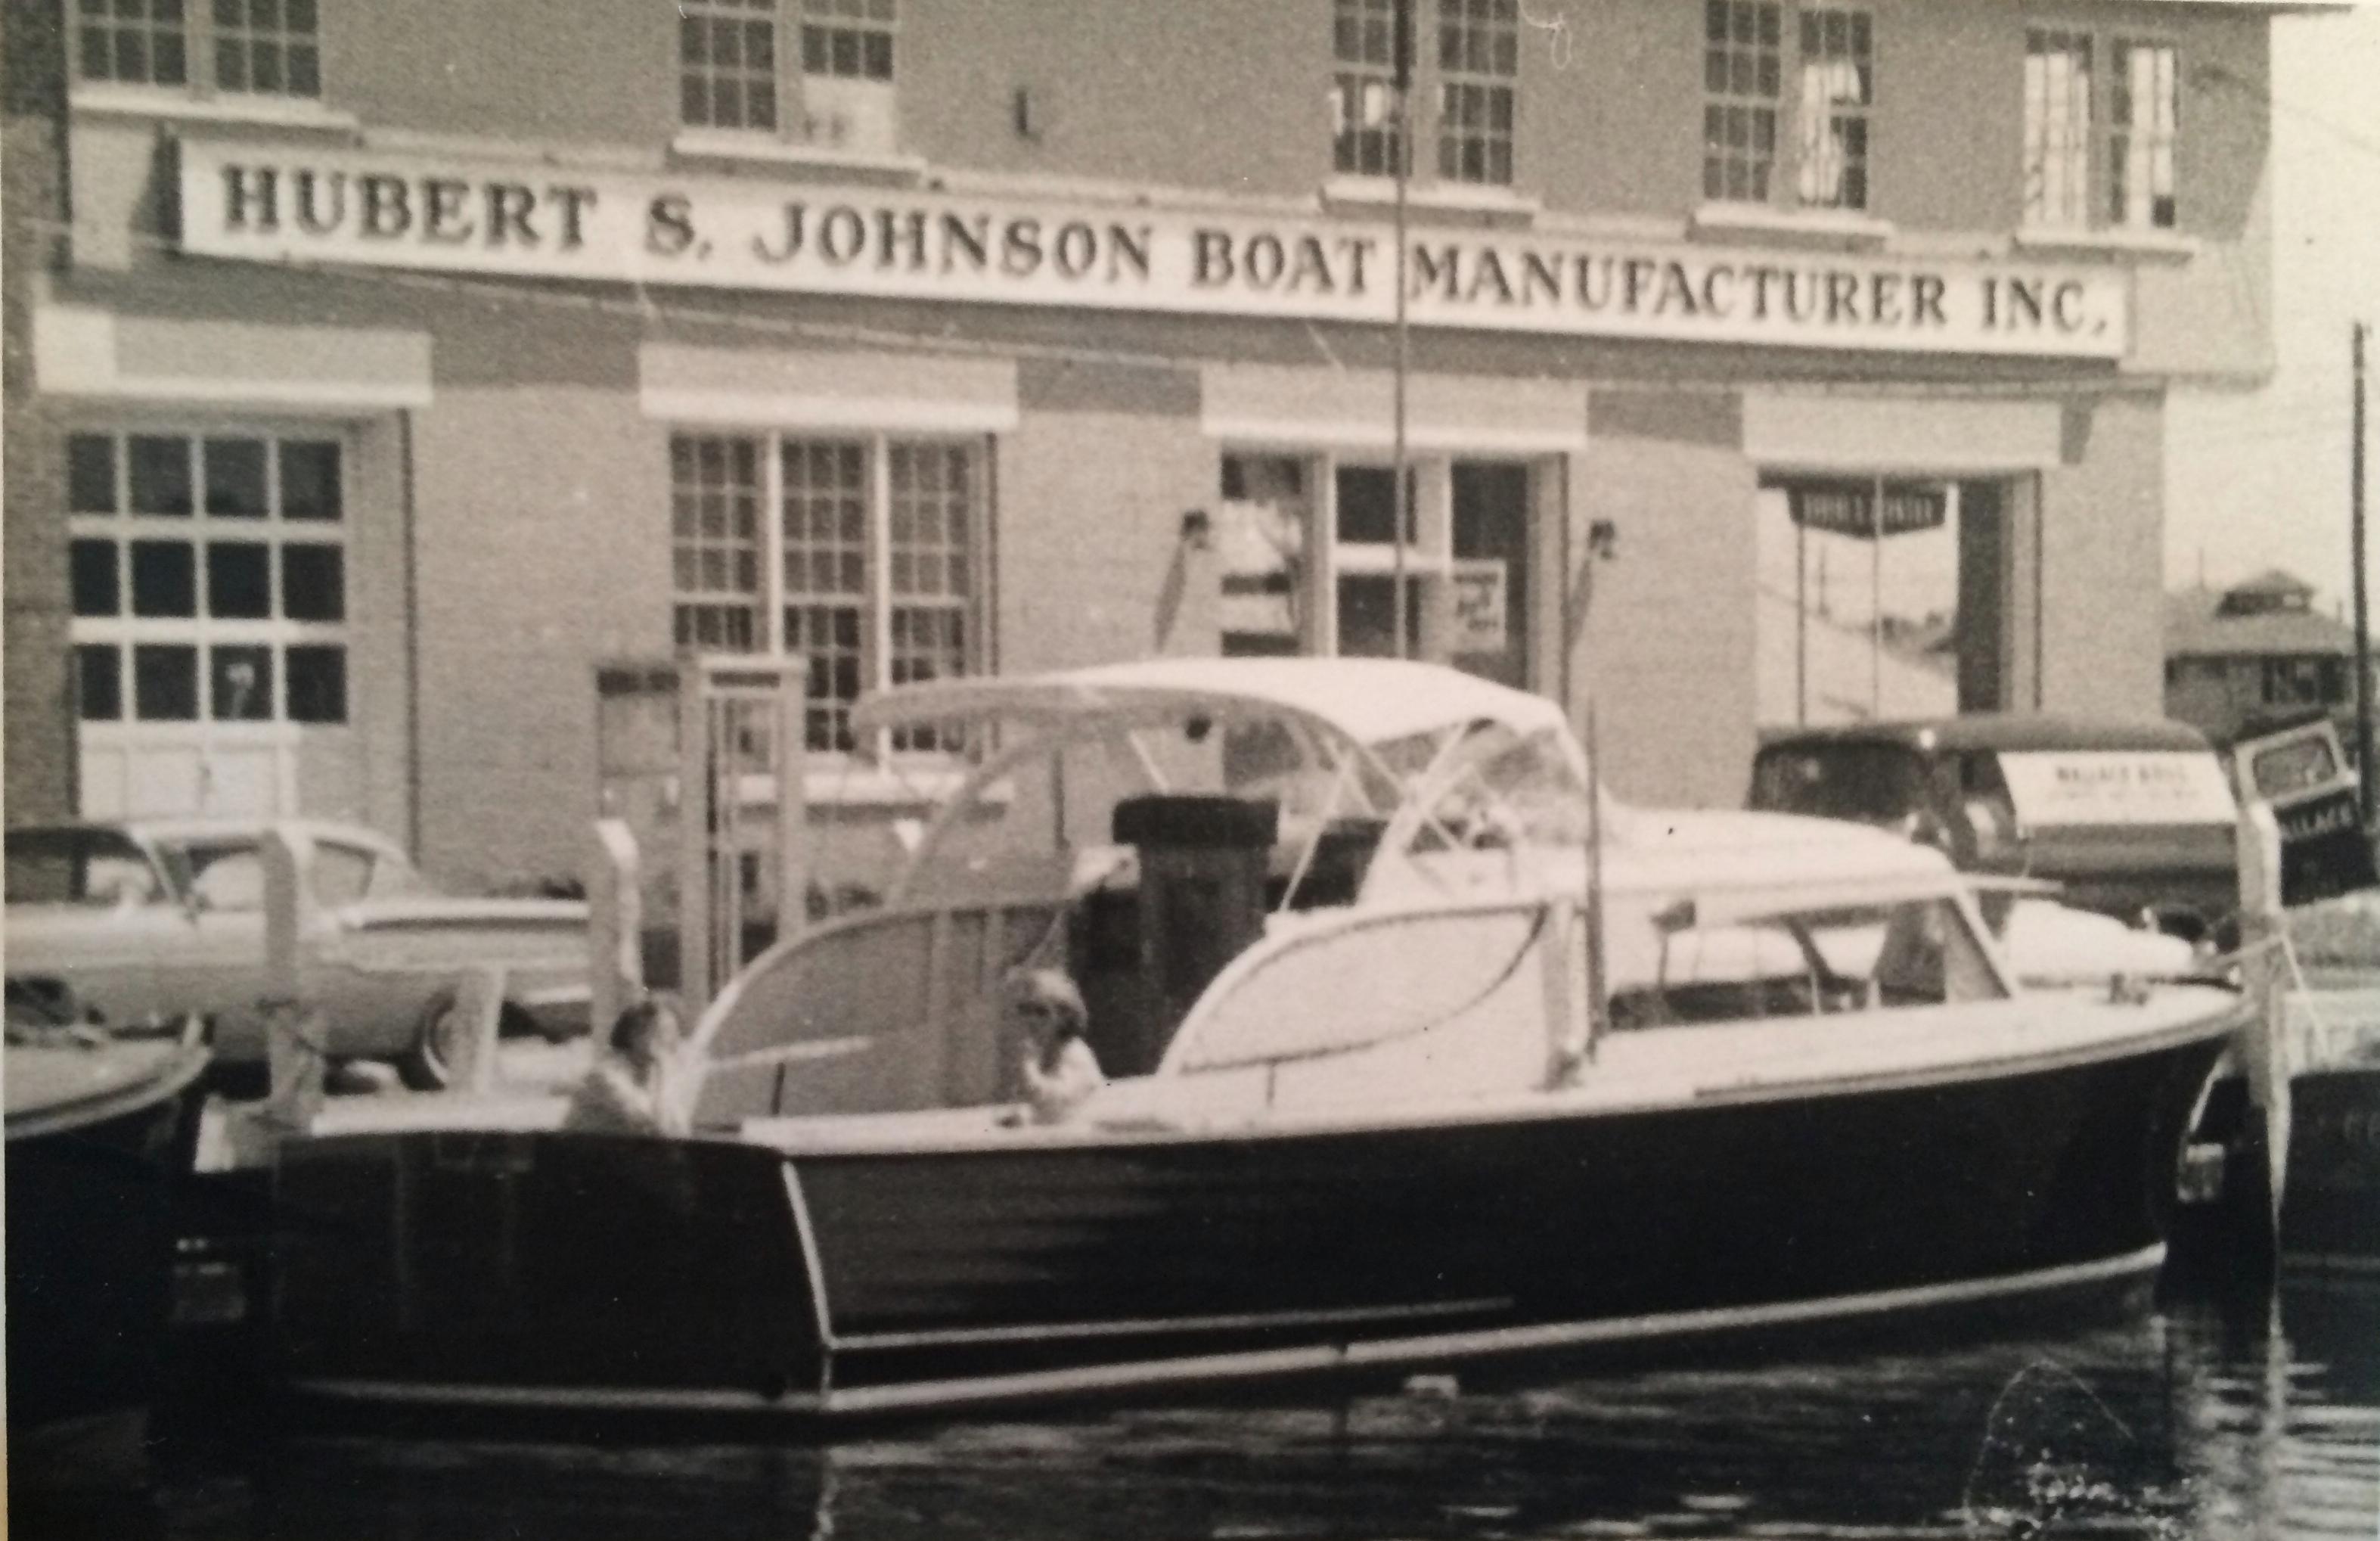 HubertSJohnsonBoatManufacturer